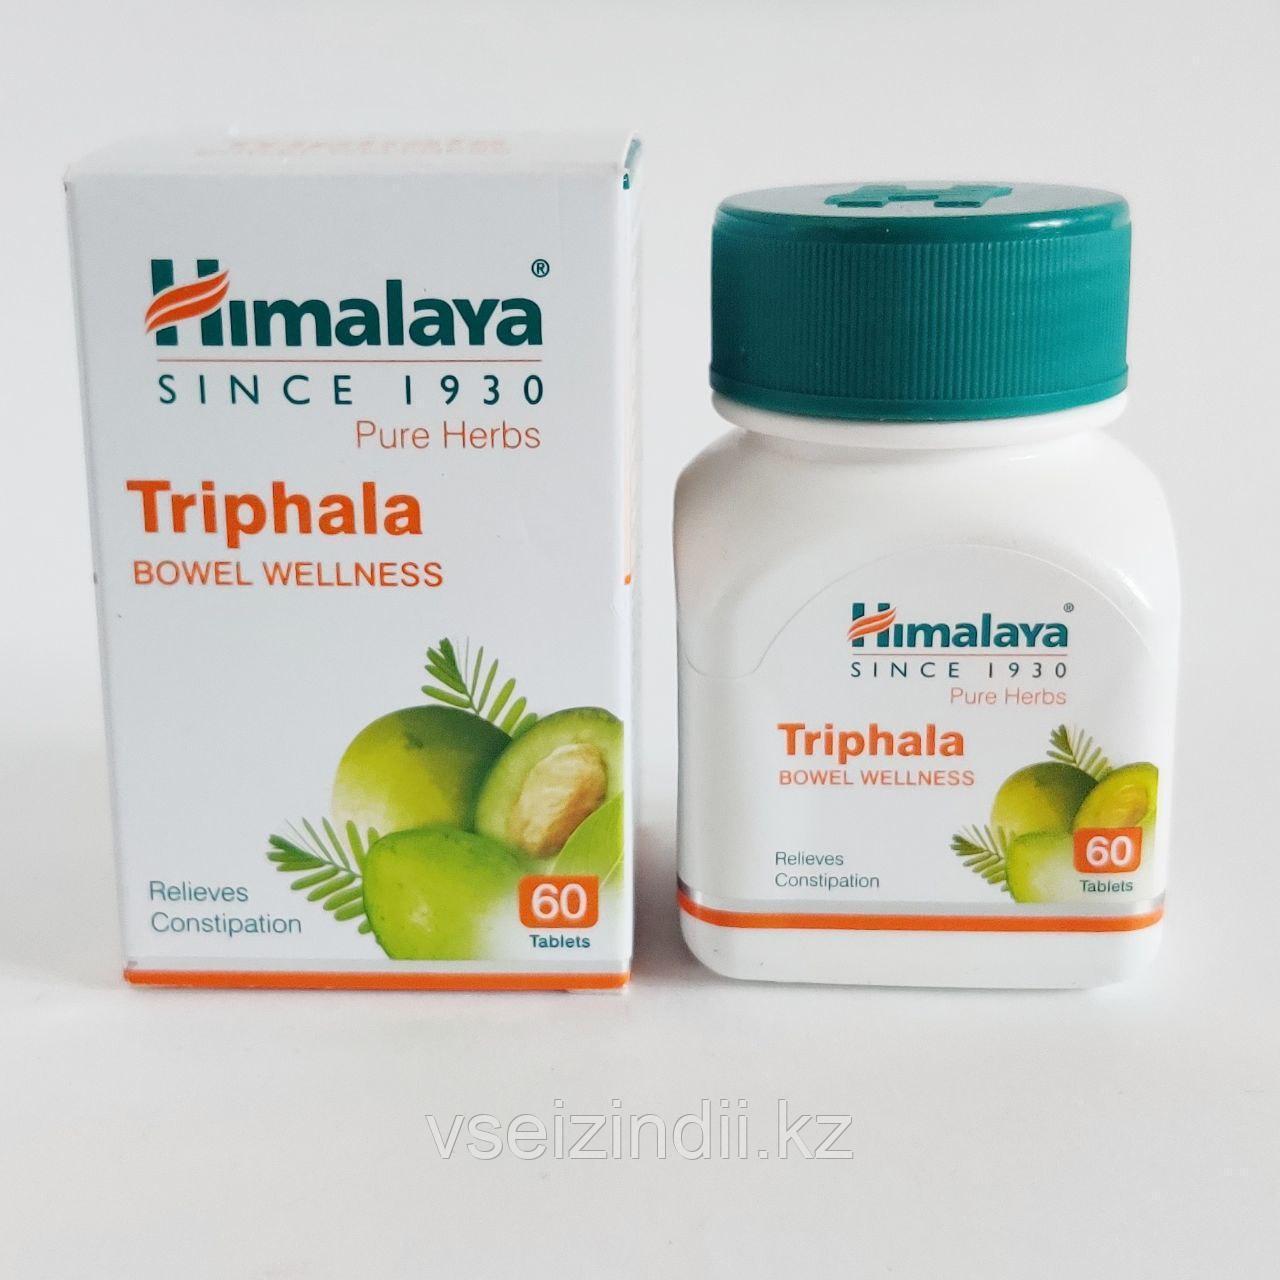 Трифала, Гималаи (Triphala, Himalaya). Очищение организма. 60 таблеток